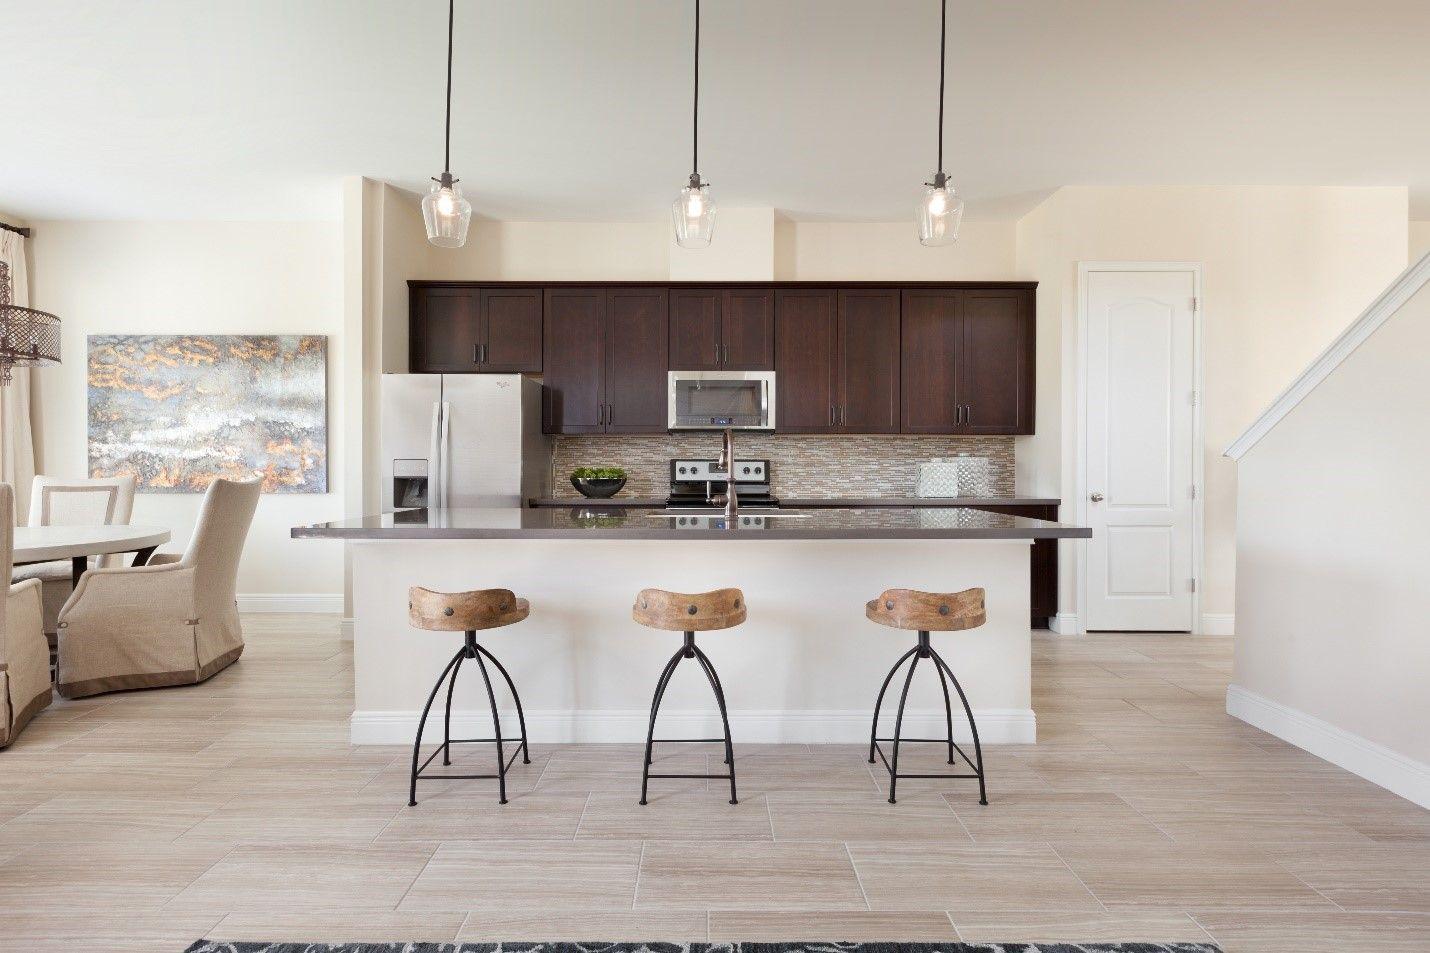 Kitchen featured in the Kilmer By Ashton Woods in Orlando, FL